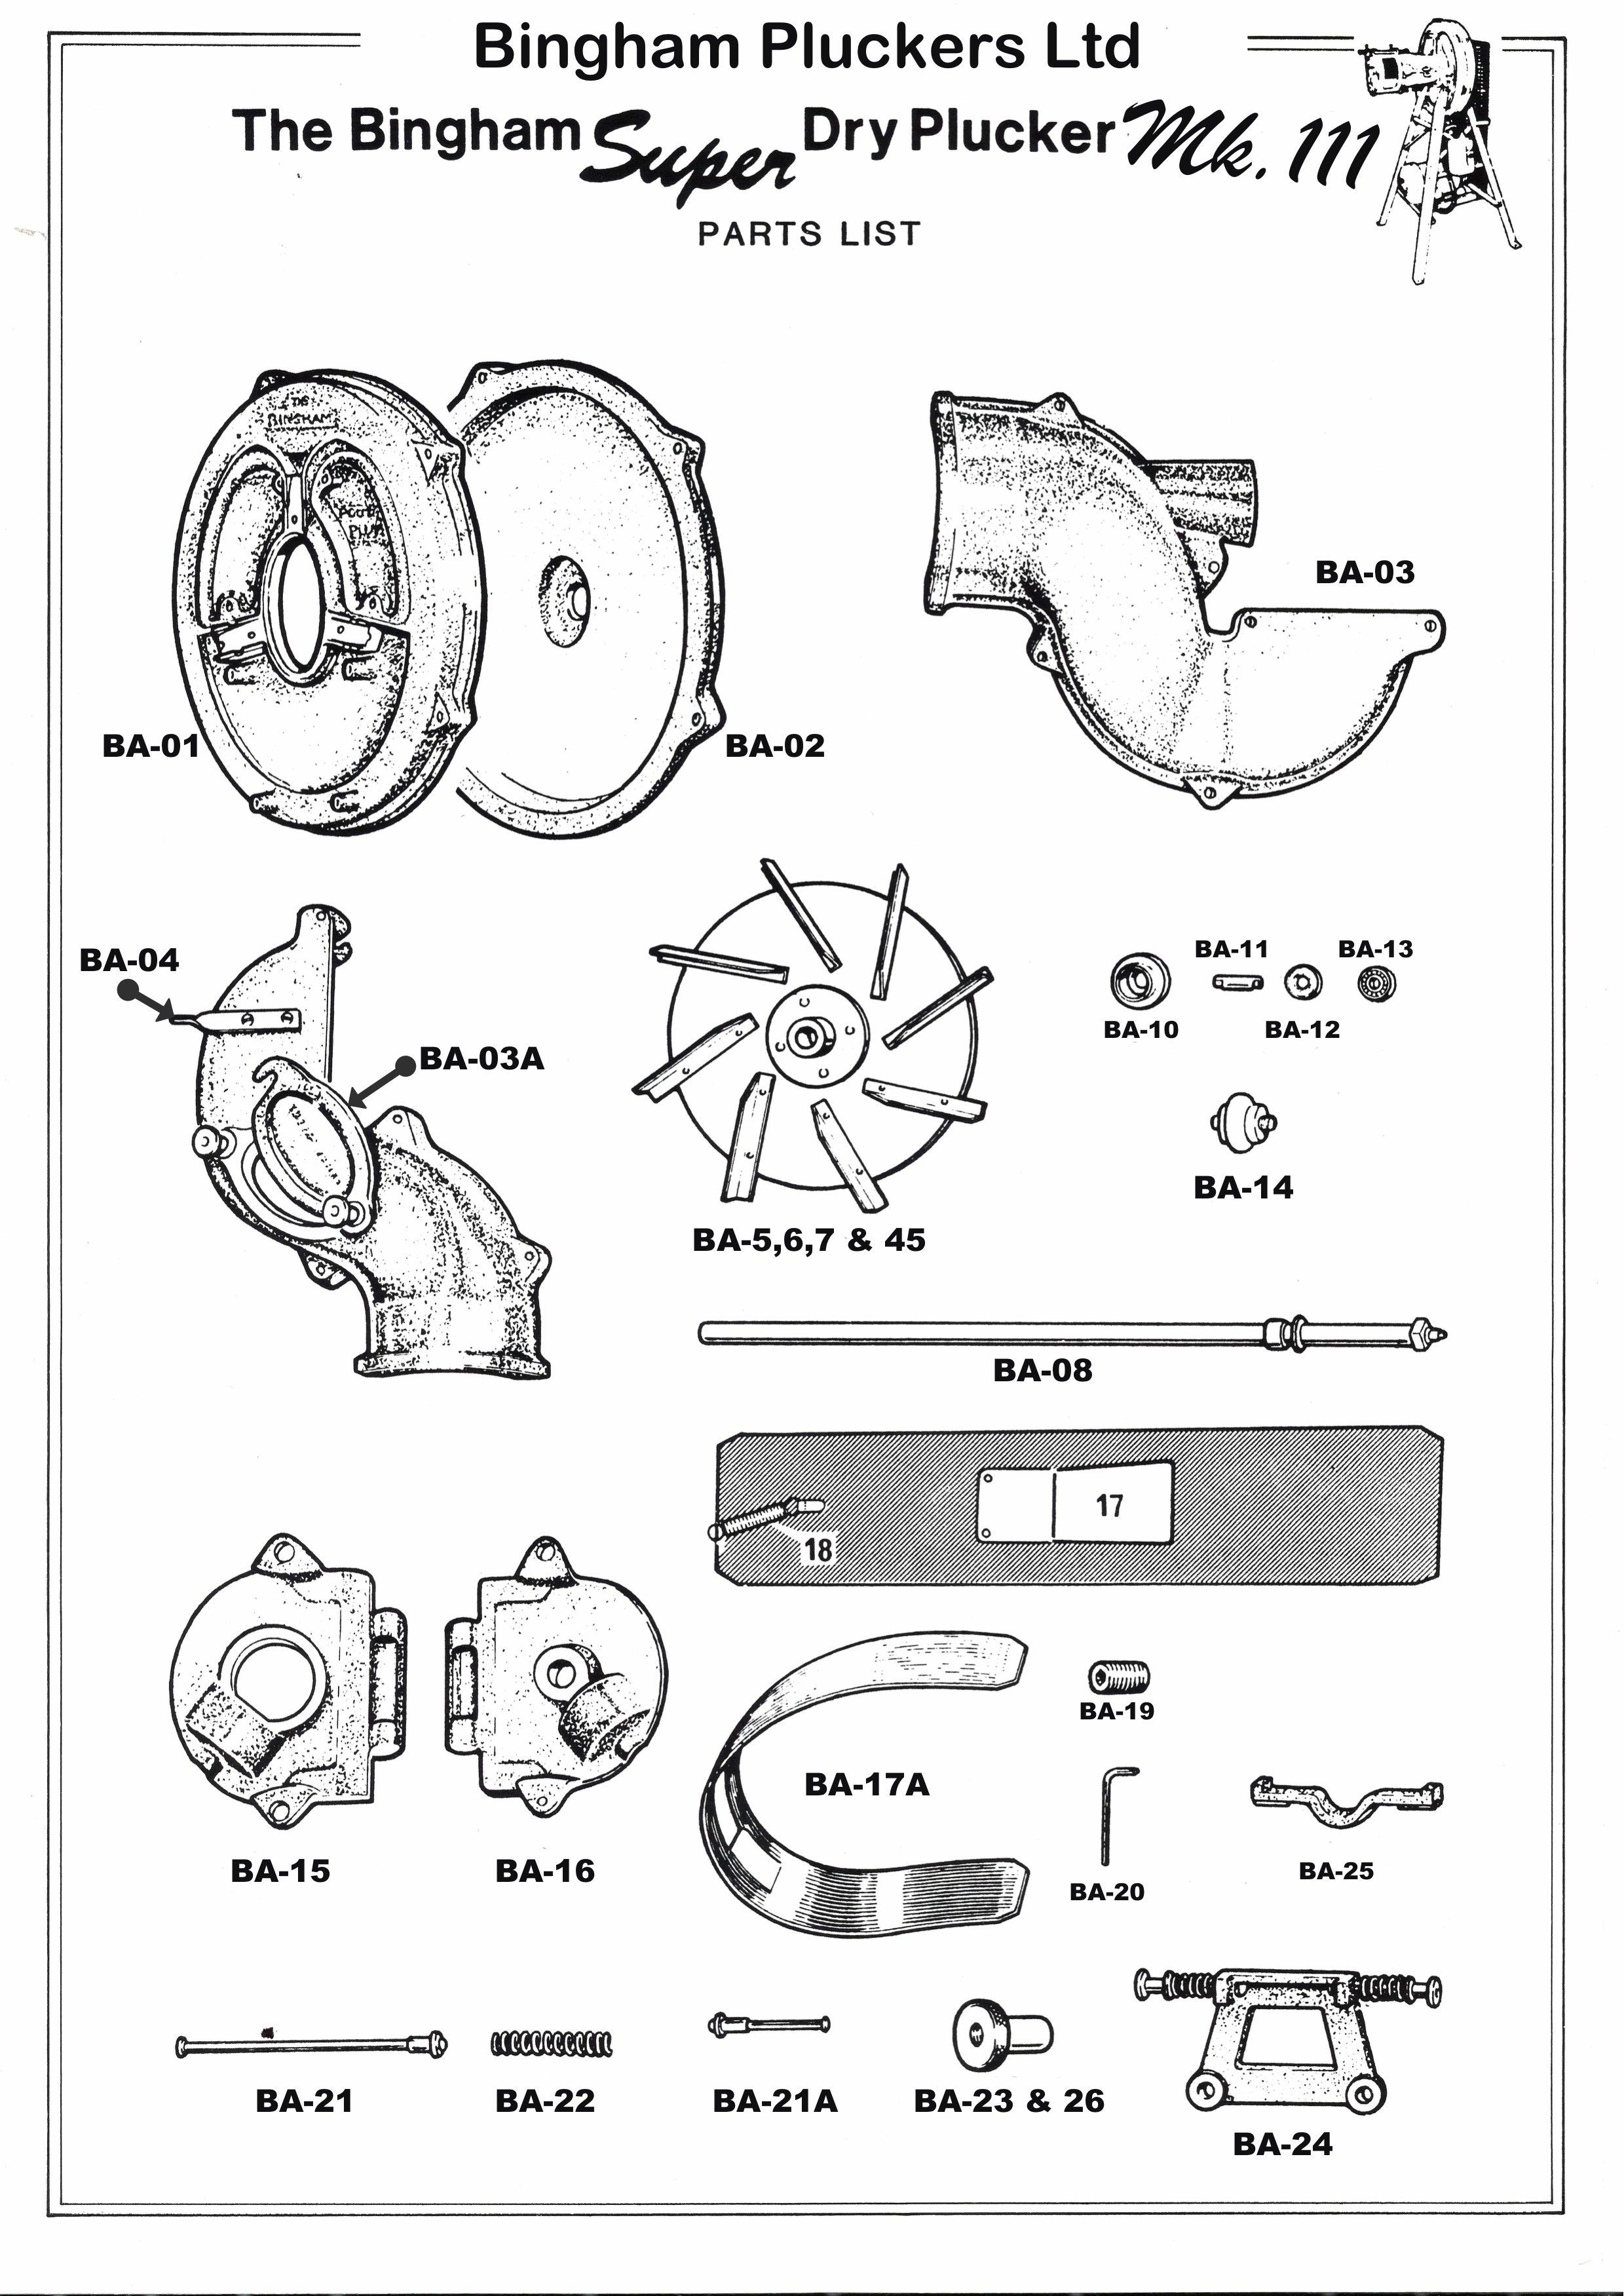 Bingham plucking machine spare parts list page 1